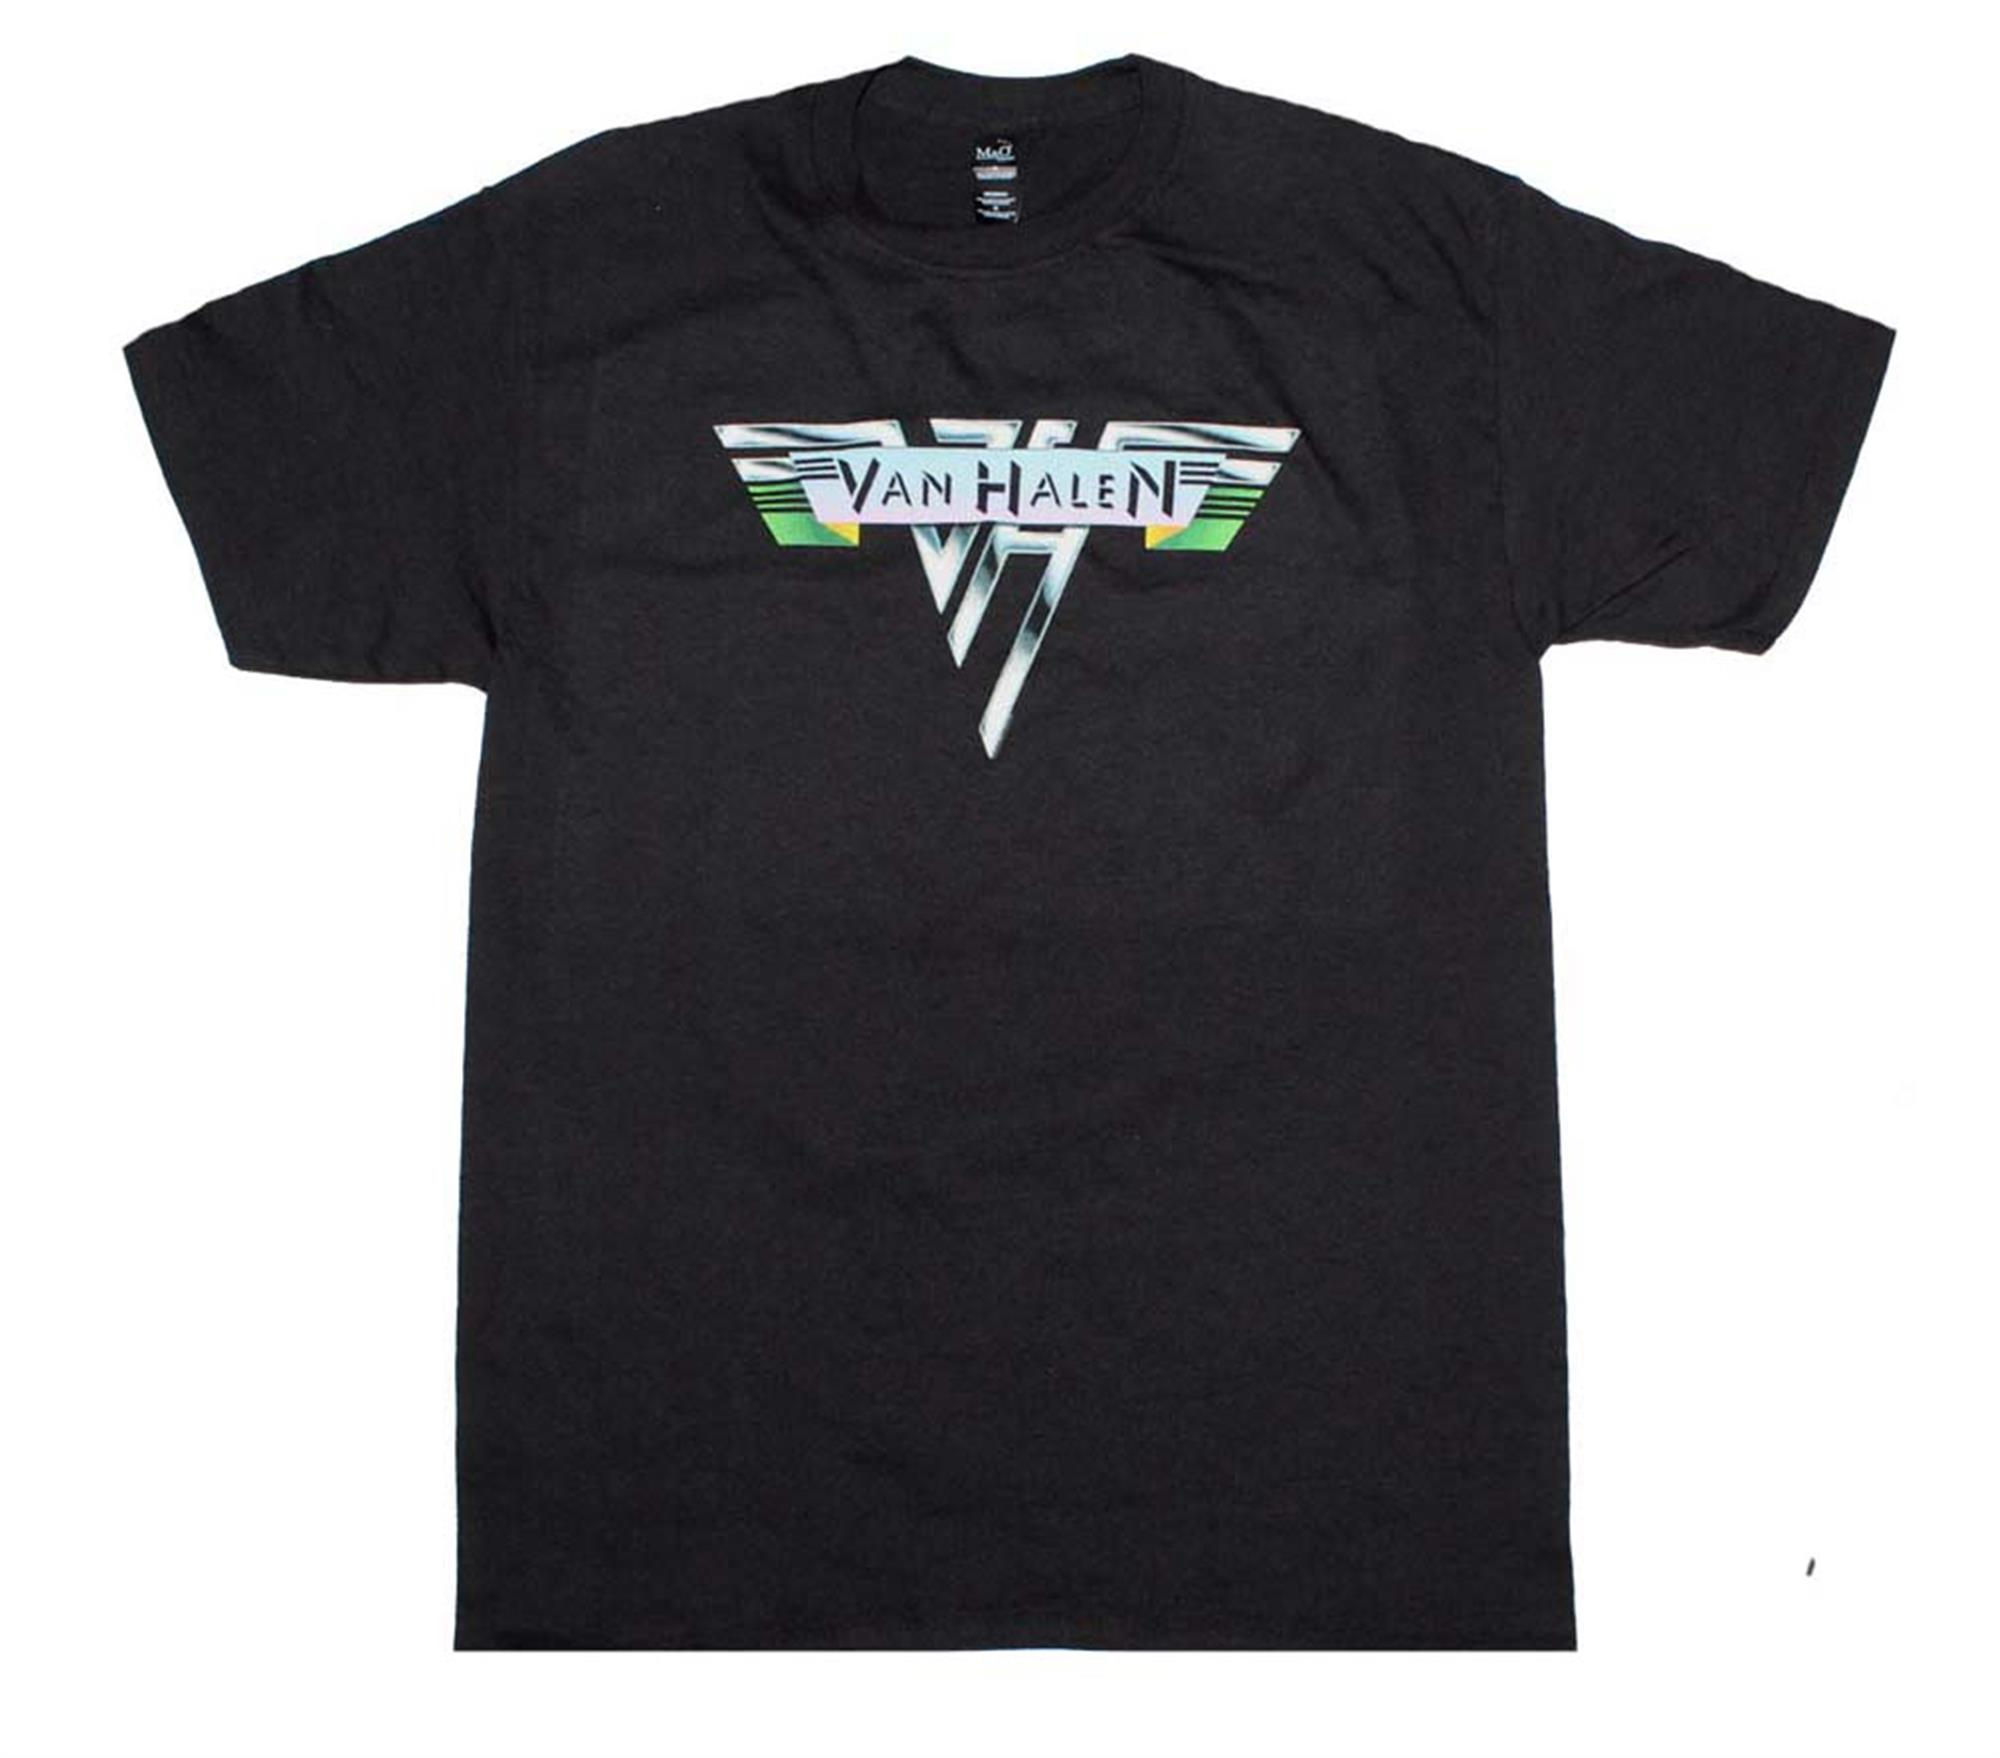 Van Halen 1978 Vintage Logo T-Shirt